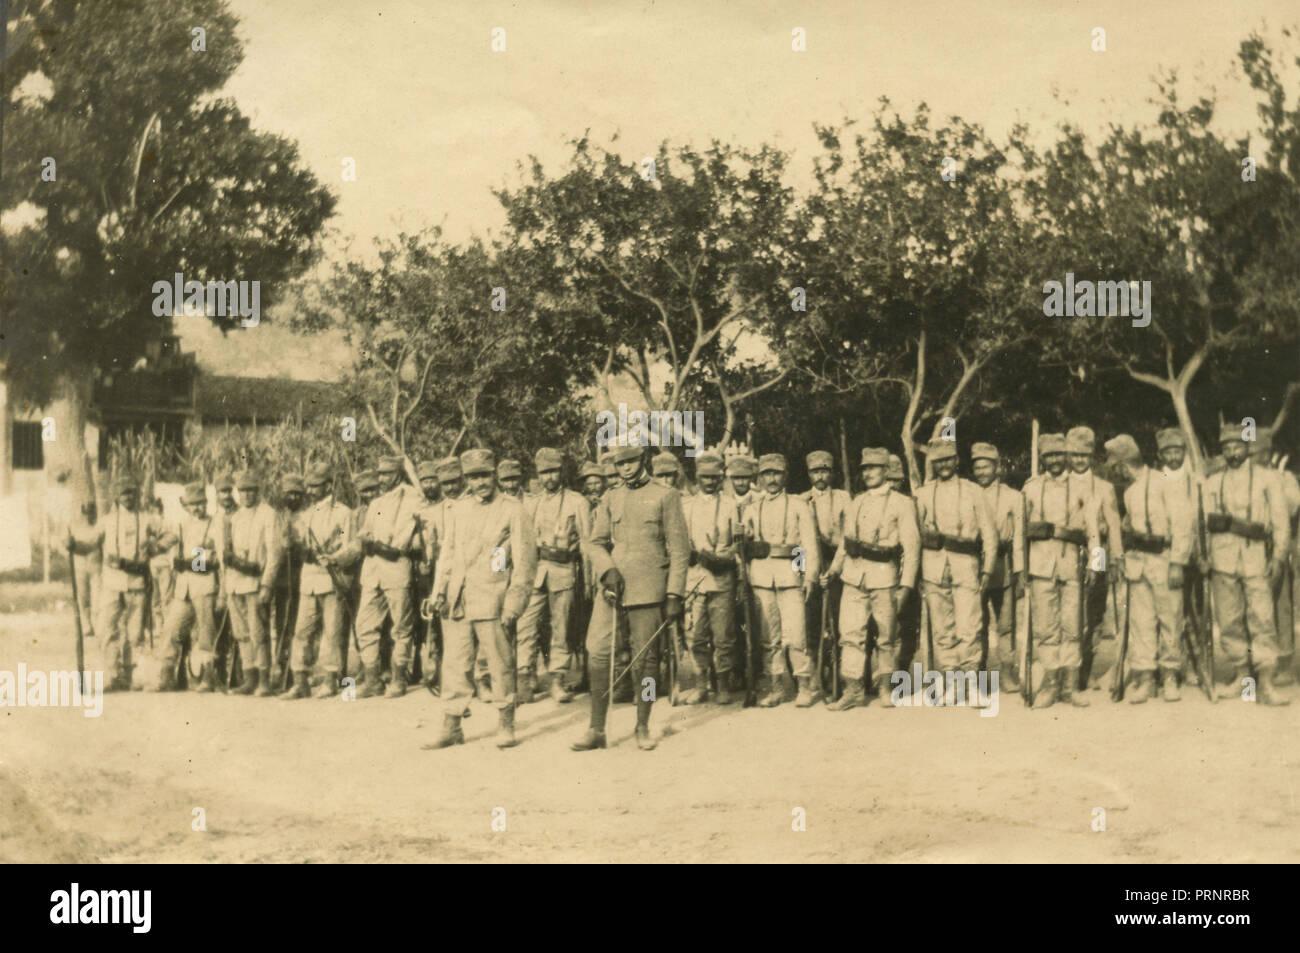 Italian Army platoon, 1910s - Stock Image